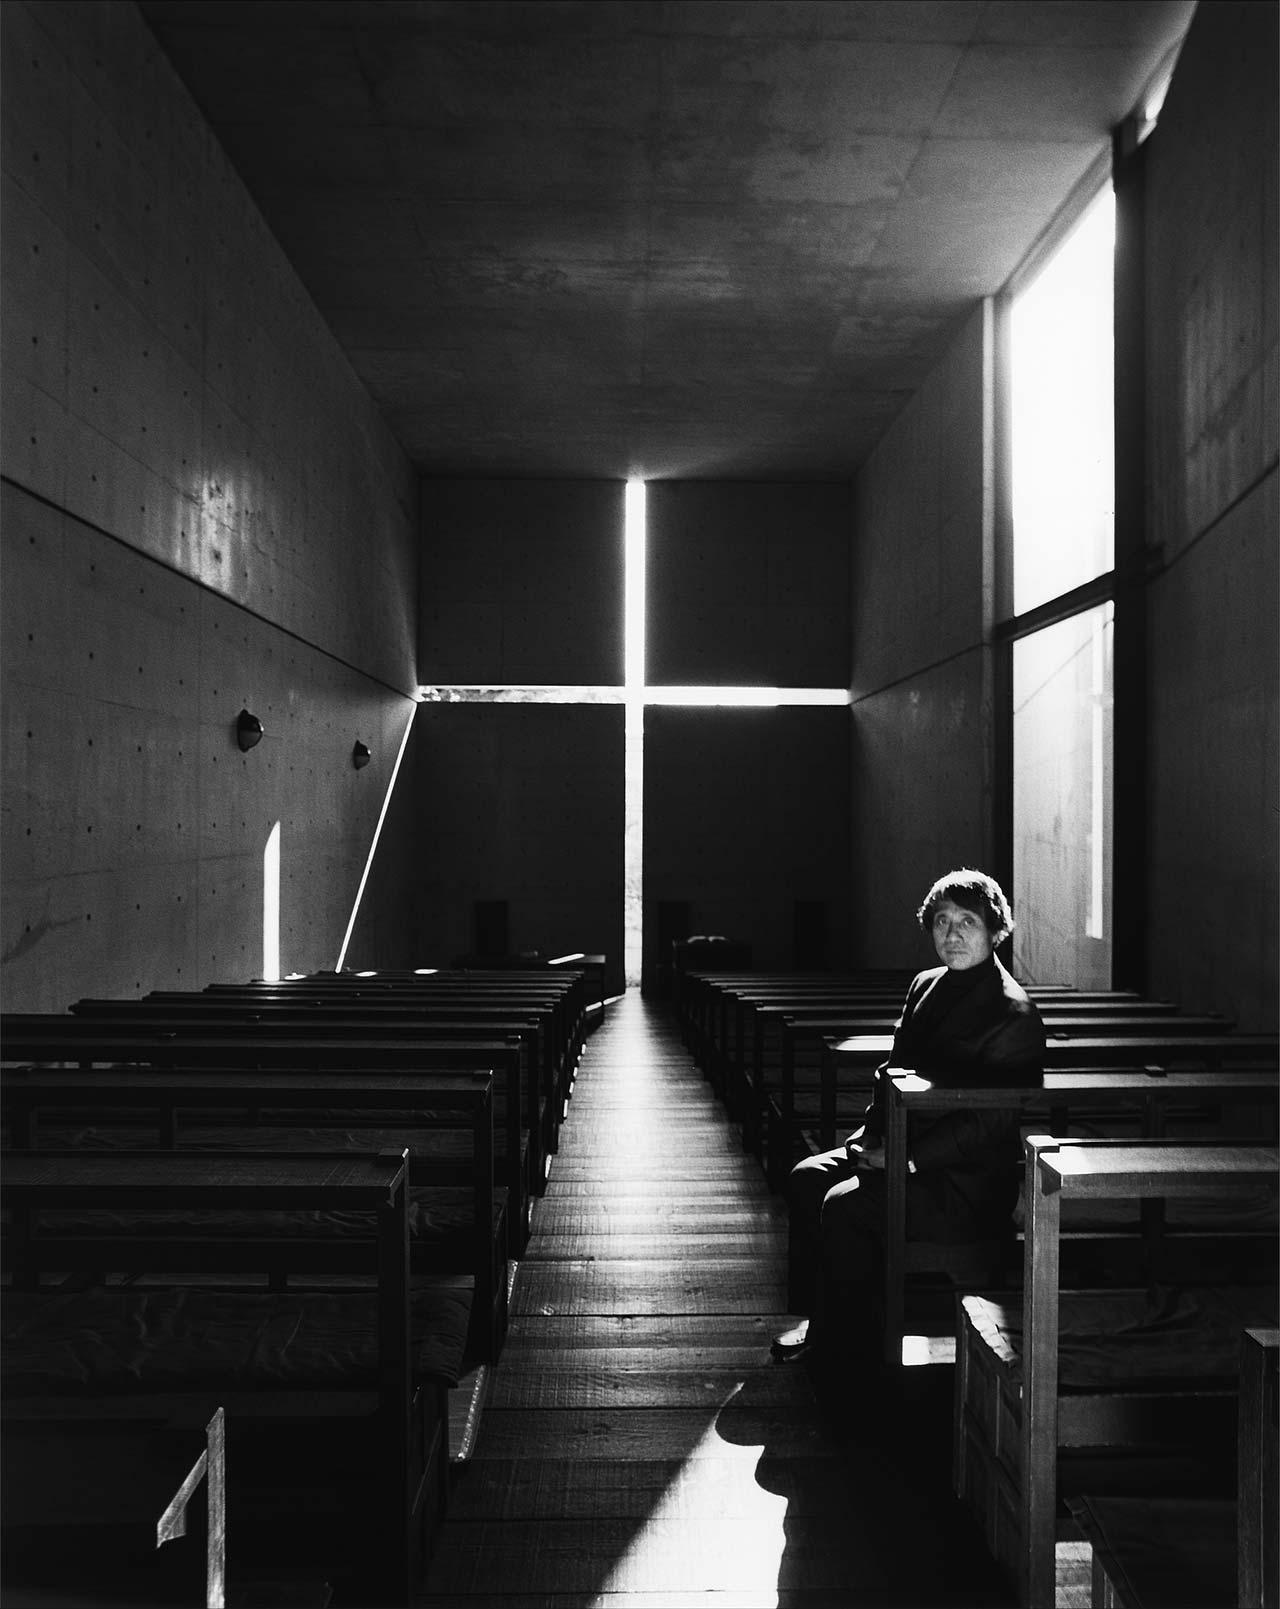 Tadao Ando Portrait. Photo by Nobuyoshi Araki.